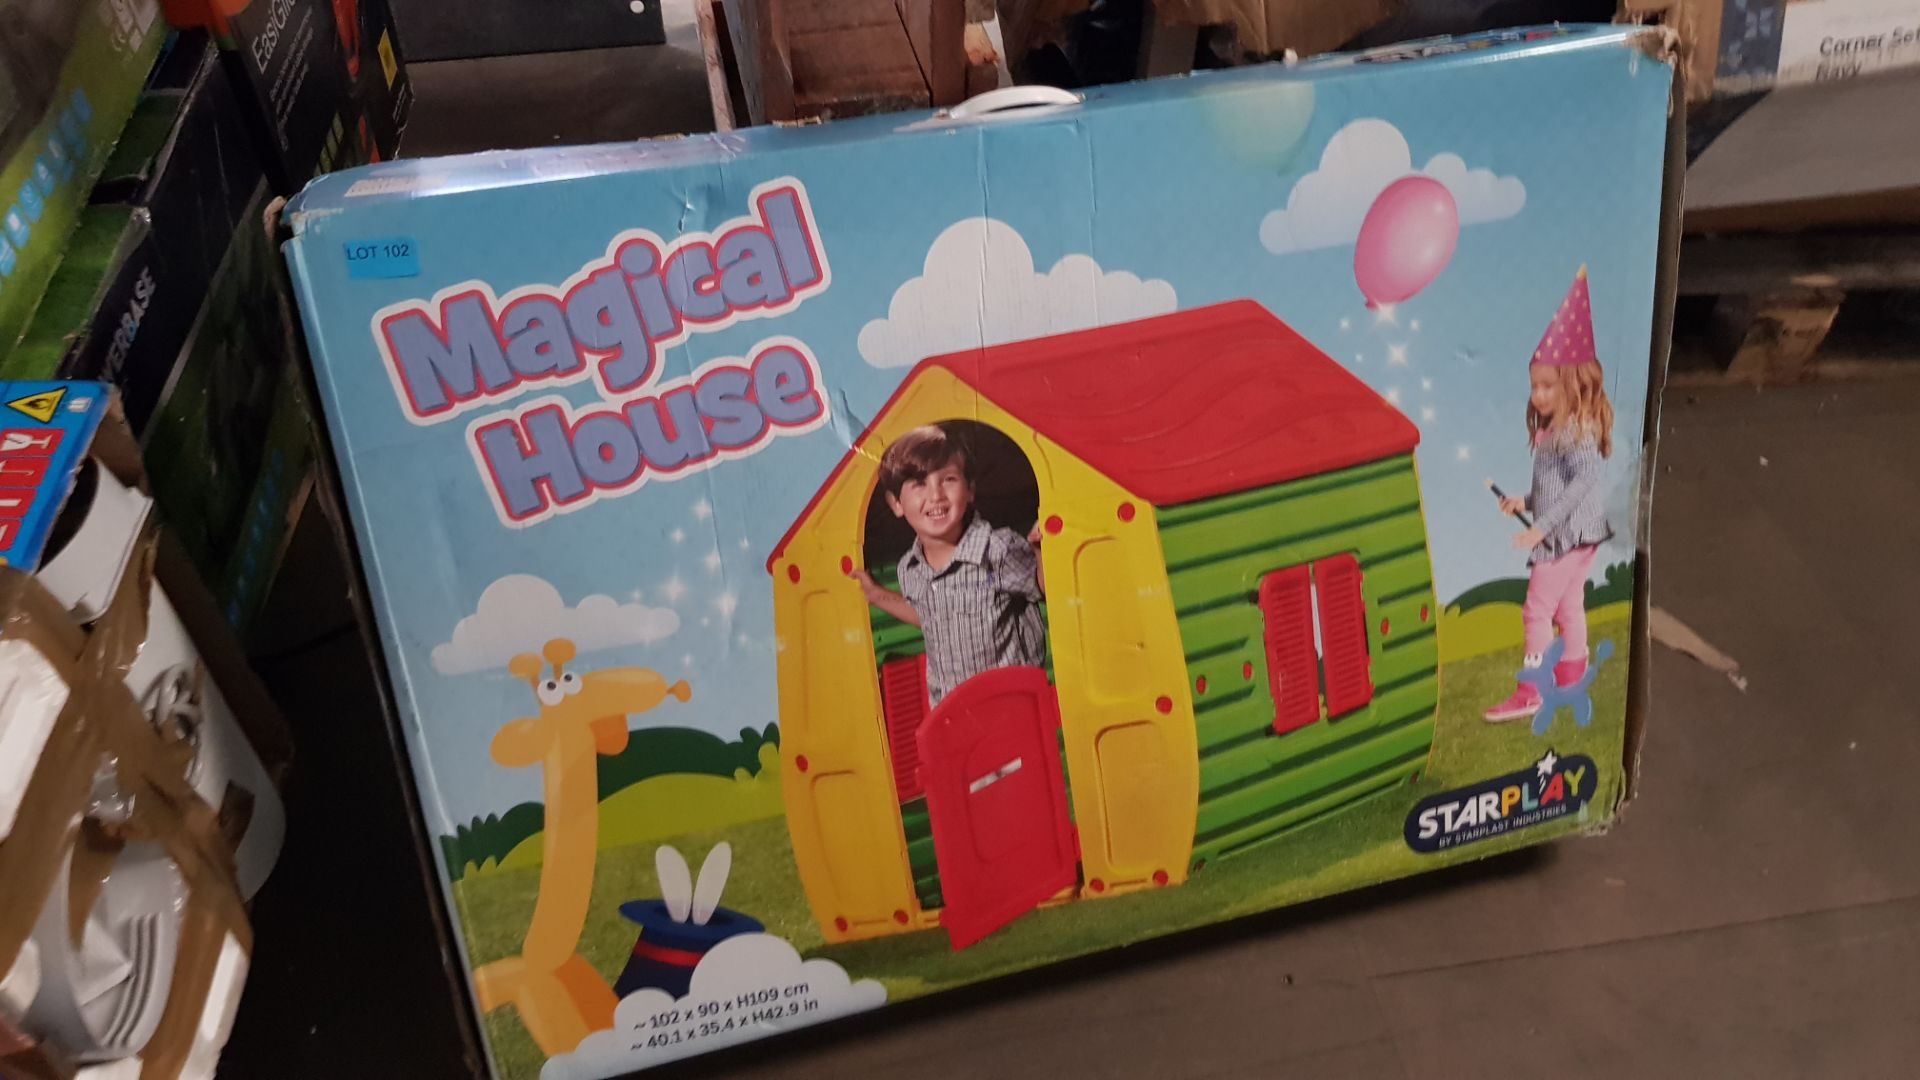 (P2) 1x Starplast Magical House (102x 90x H109cm) - Image 3 of 4